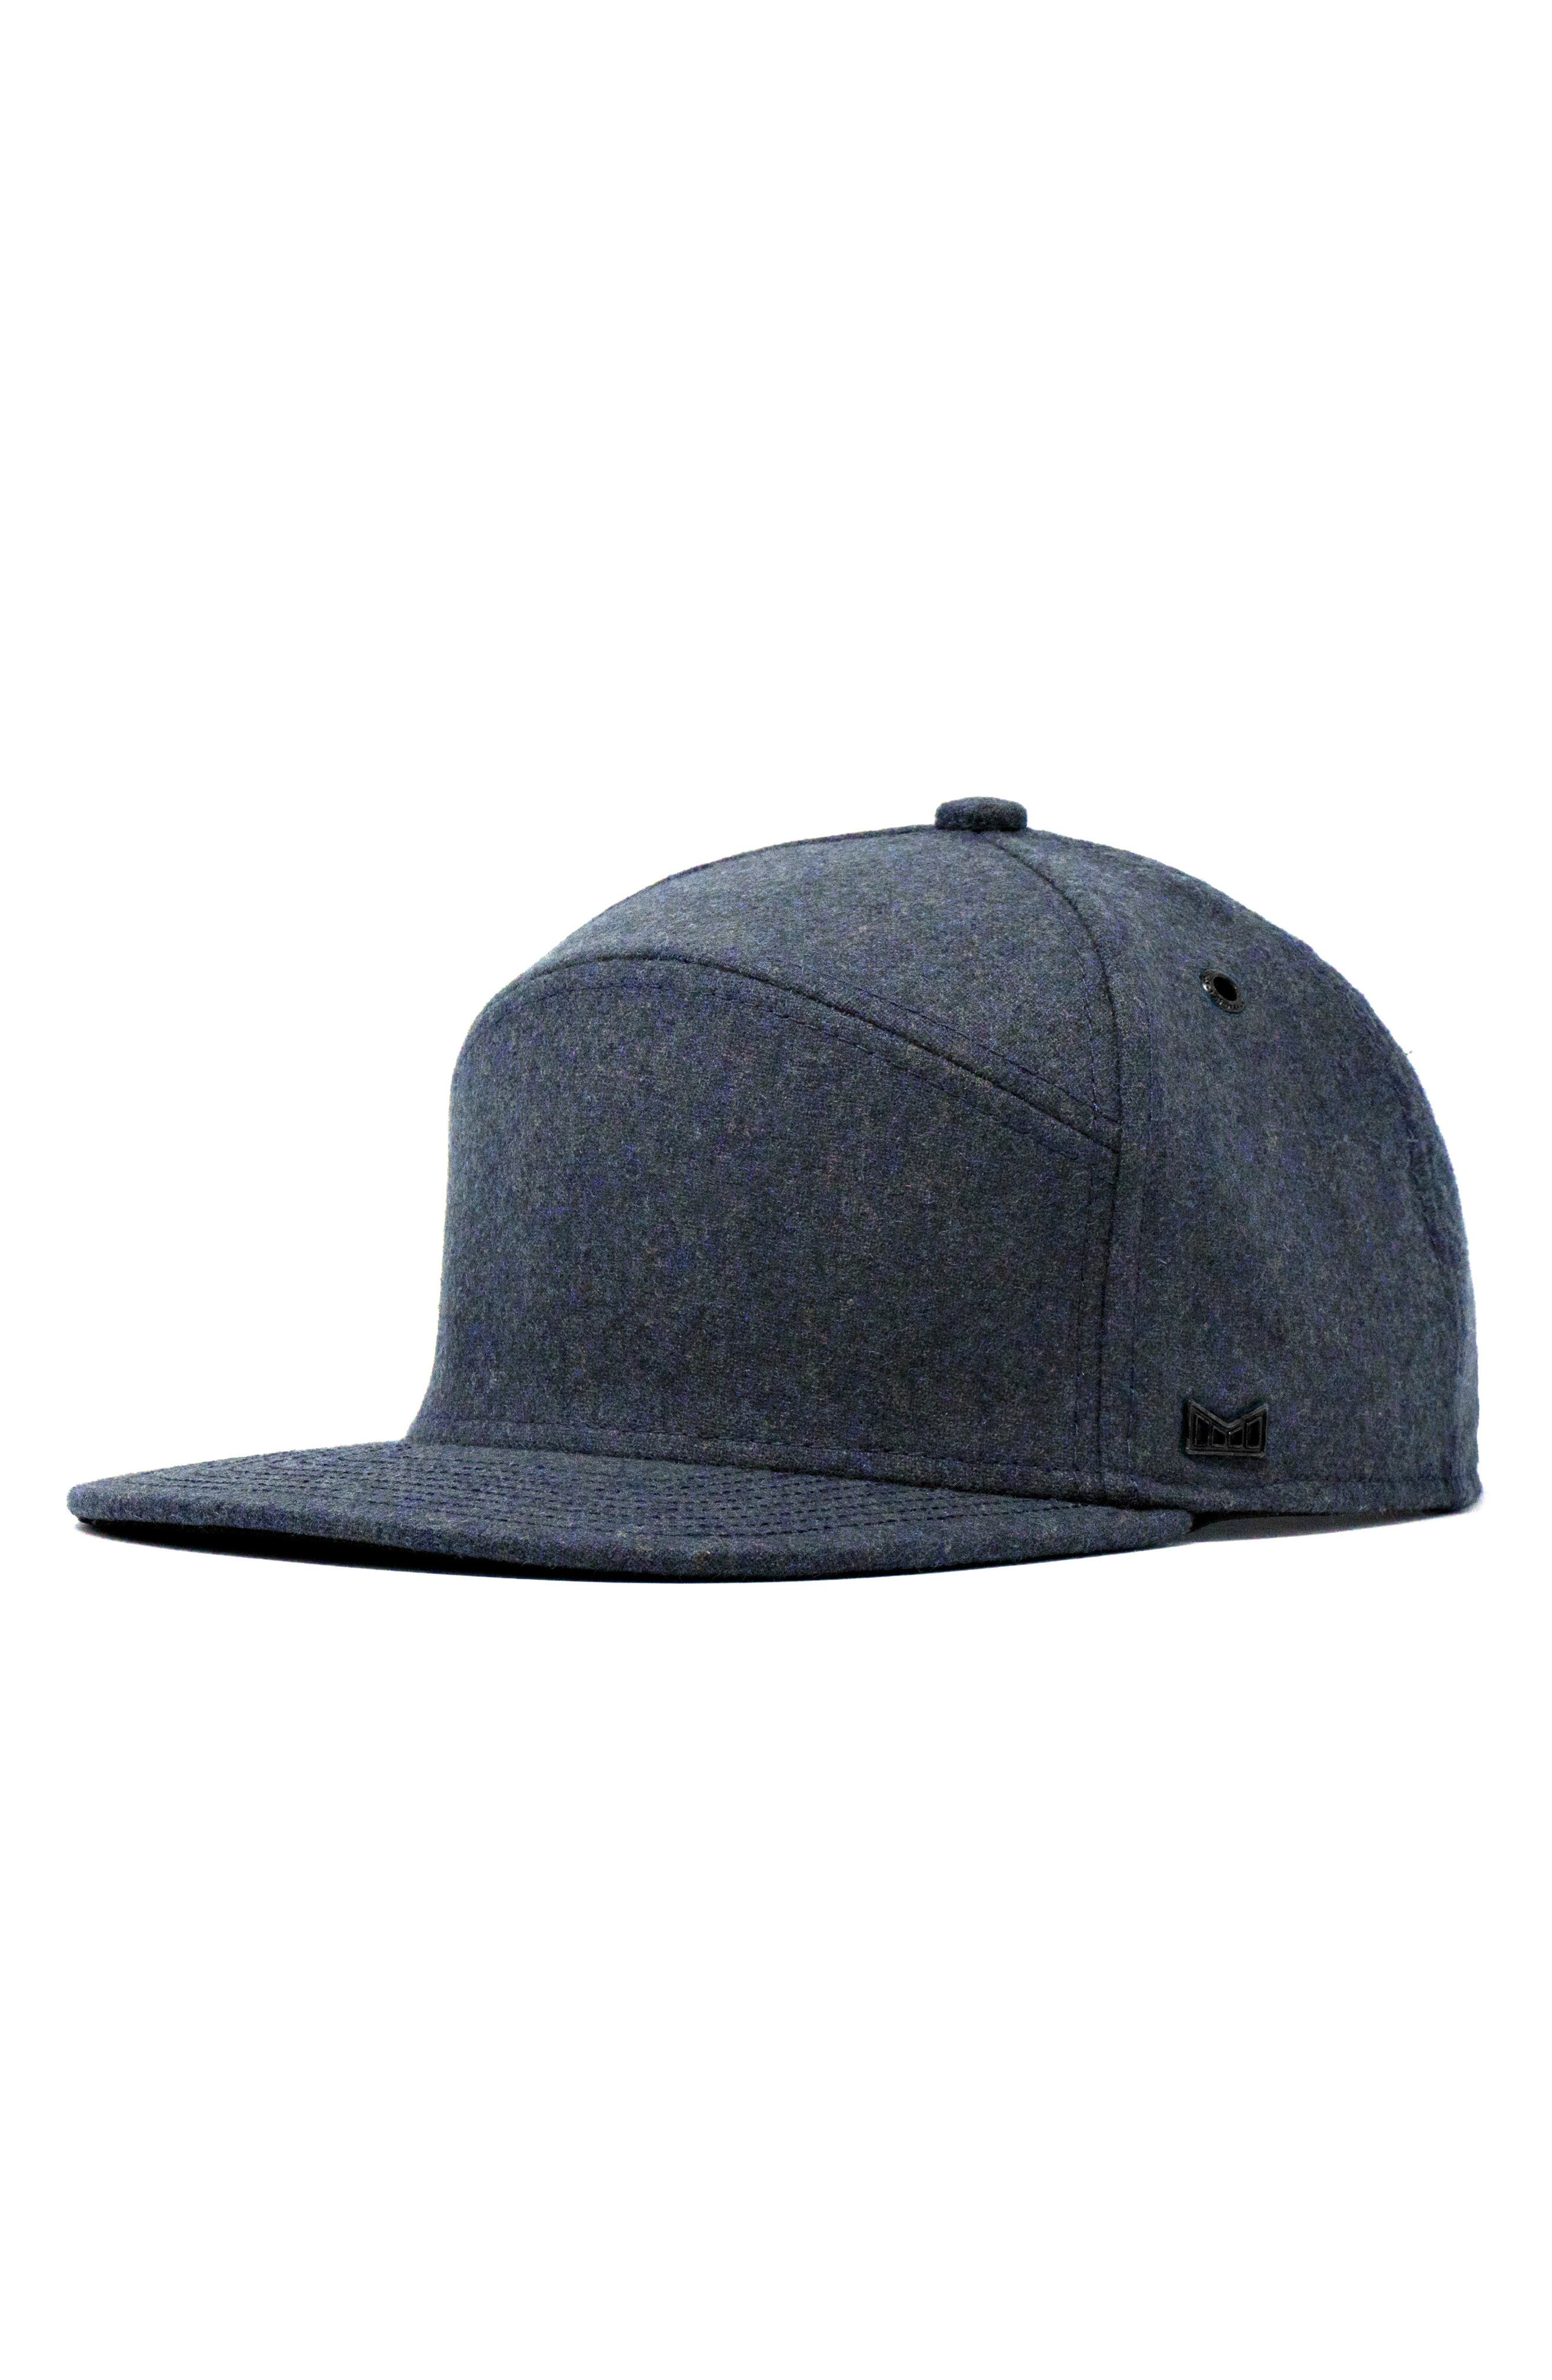 The Advocate Wool Baseball Cap